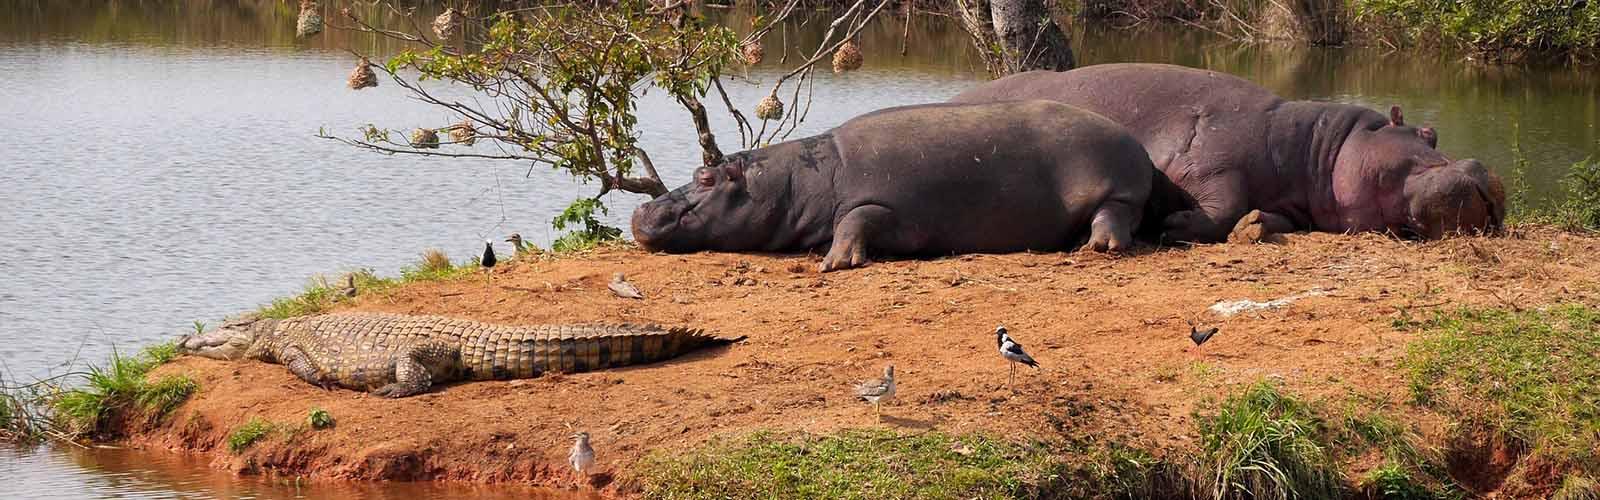 Hippo Hunting